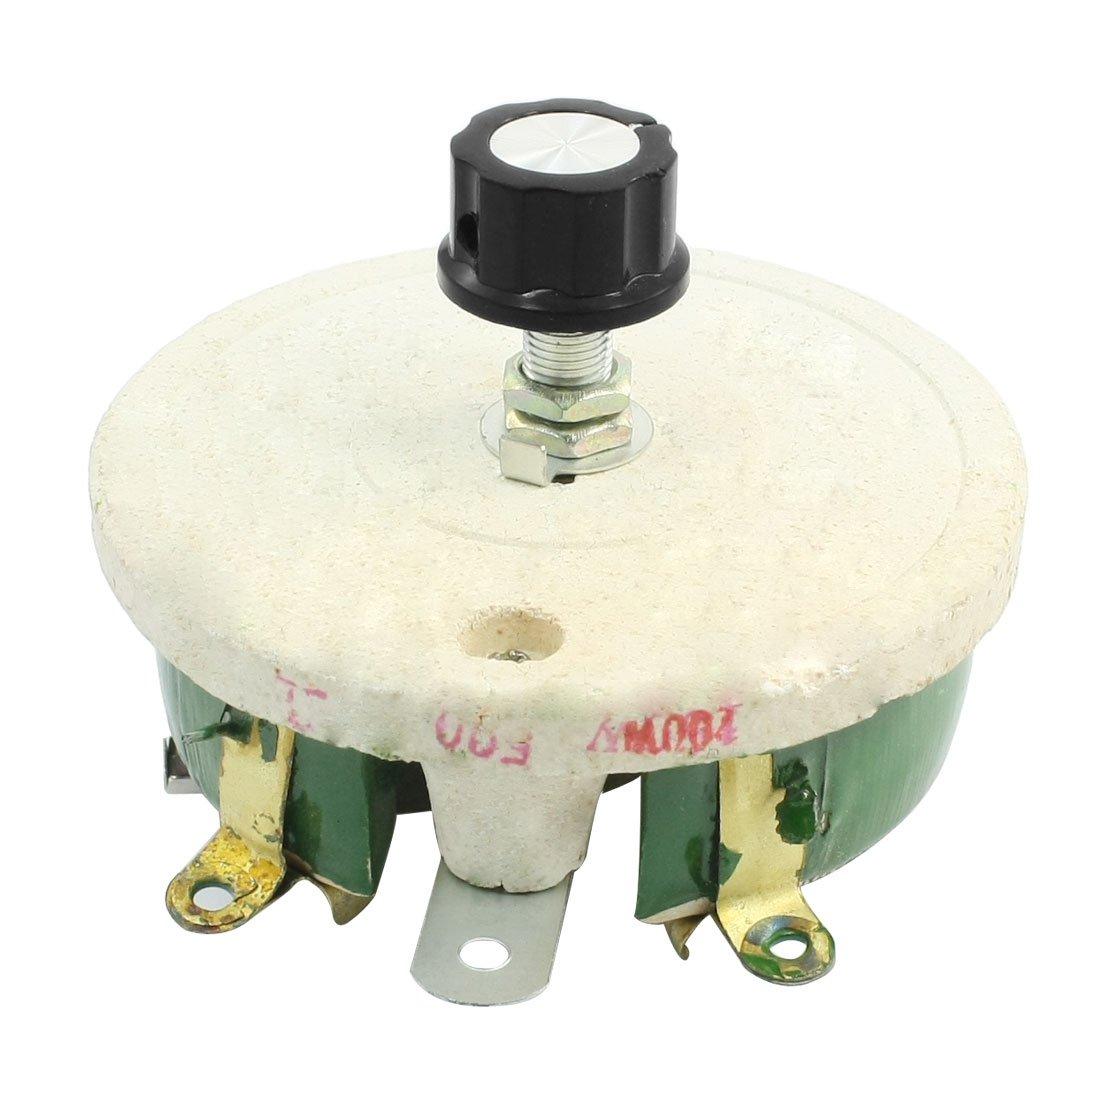 Wirewound Ceramic Potentiometer Variable Rheostat Resistor 200W 500ohm